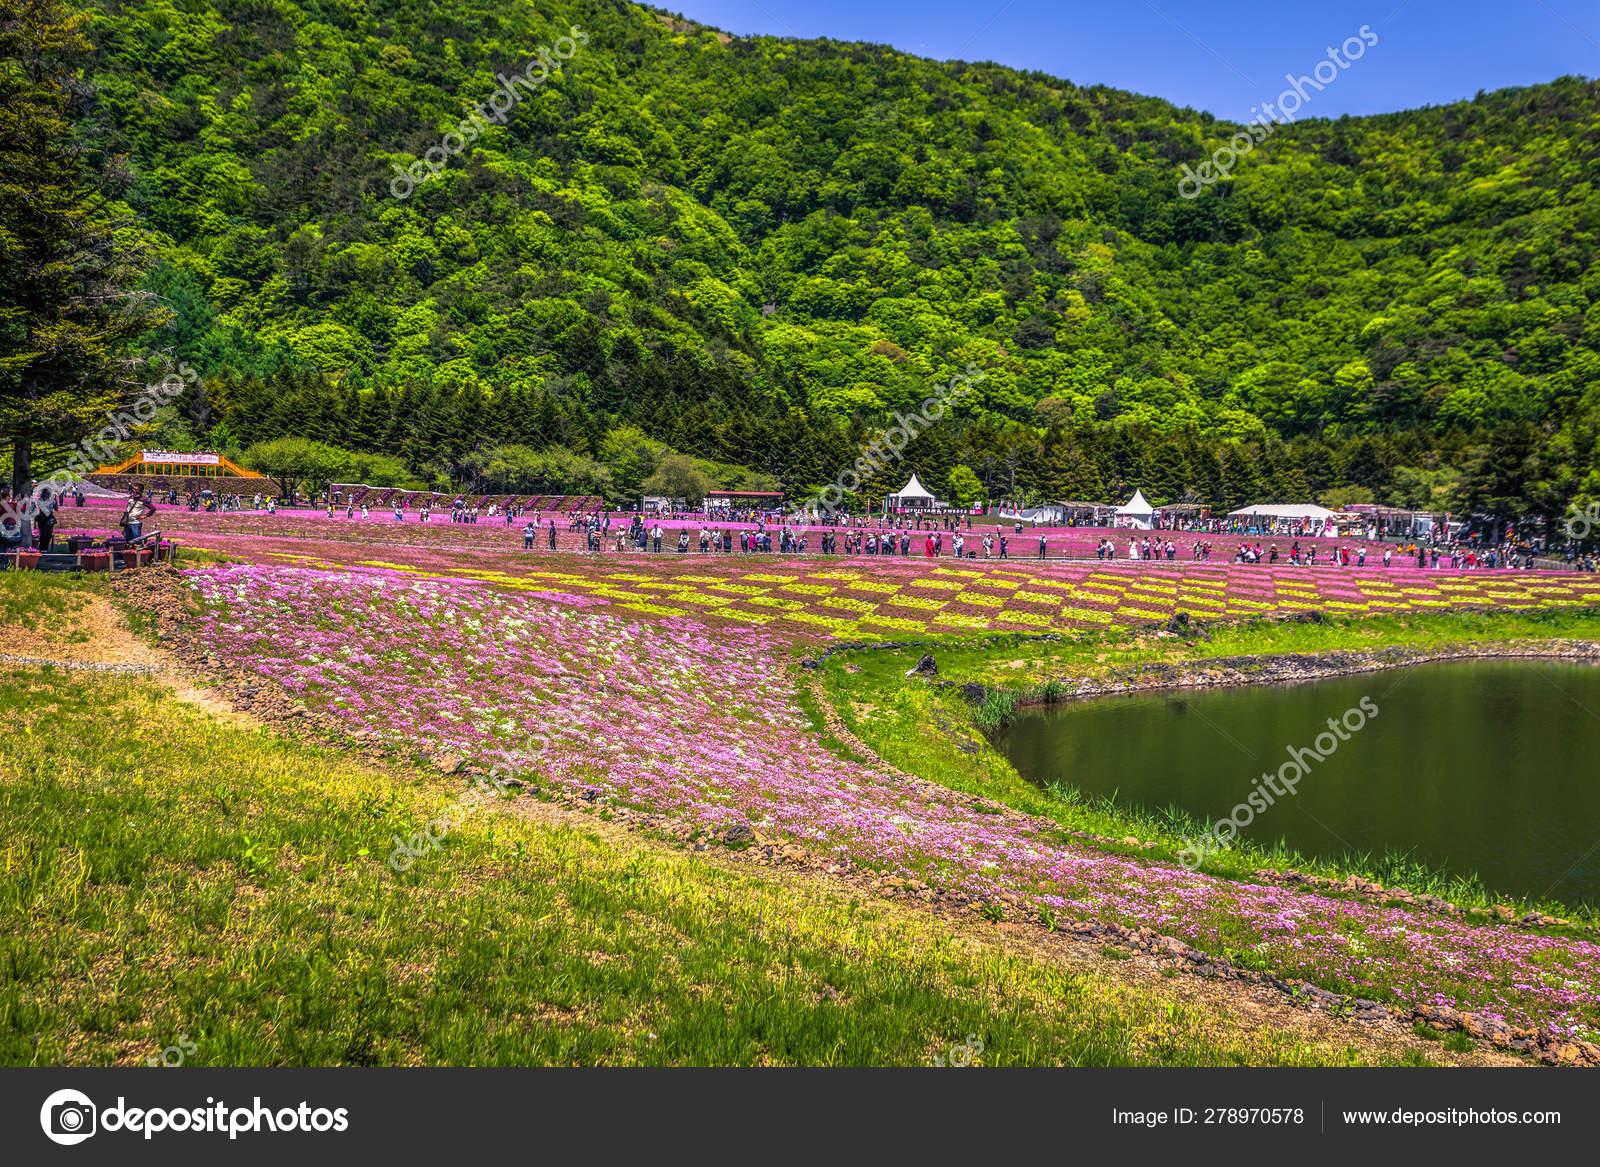 Motosu - May 24, 2019: Flower fields of Shiba-Sakura